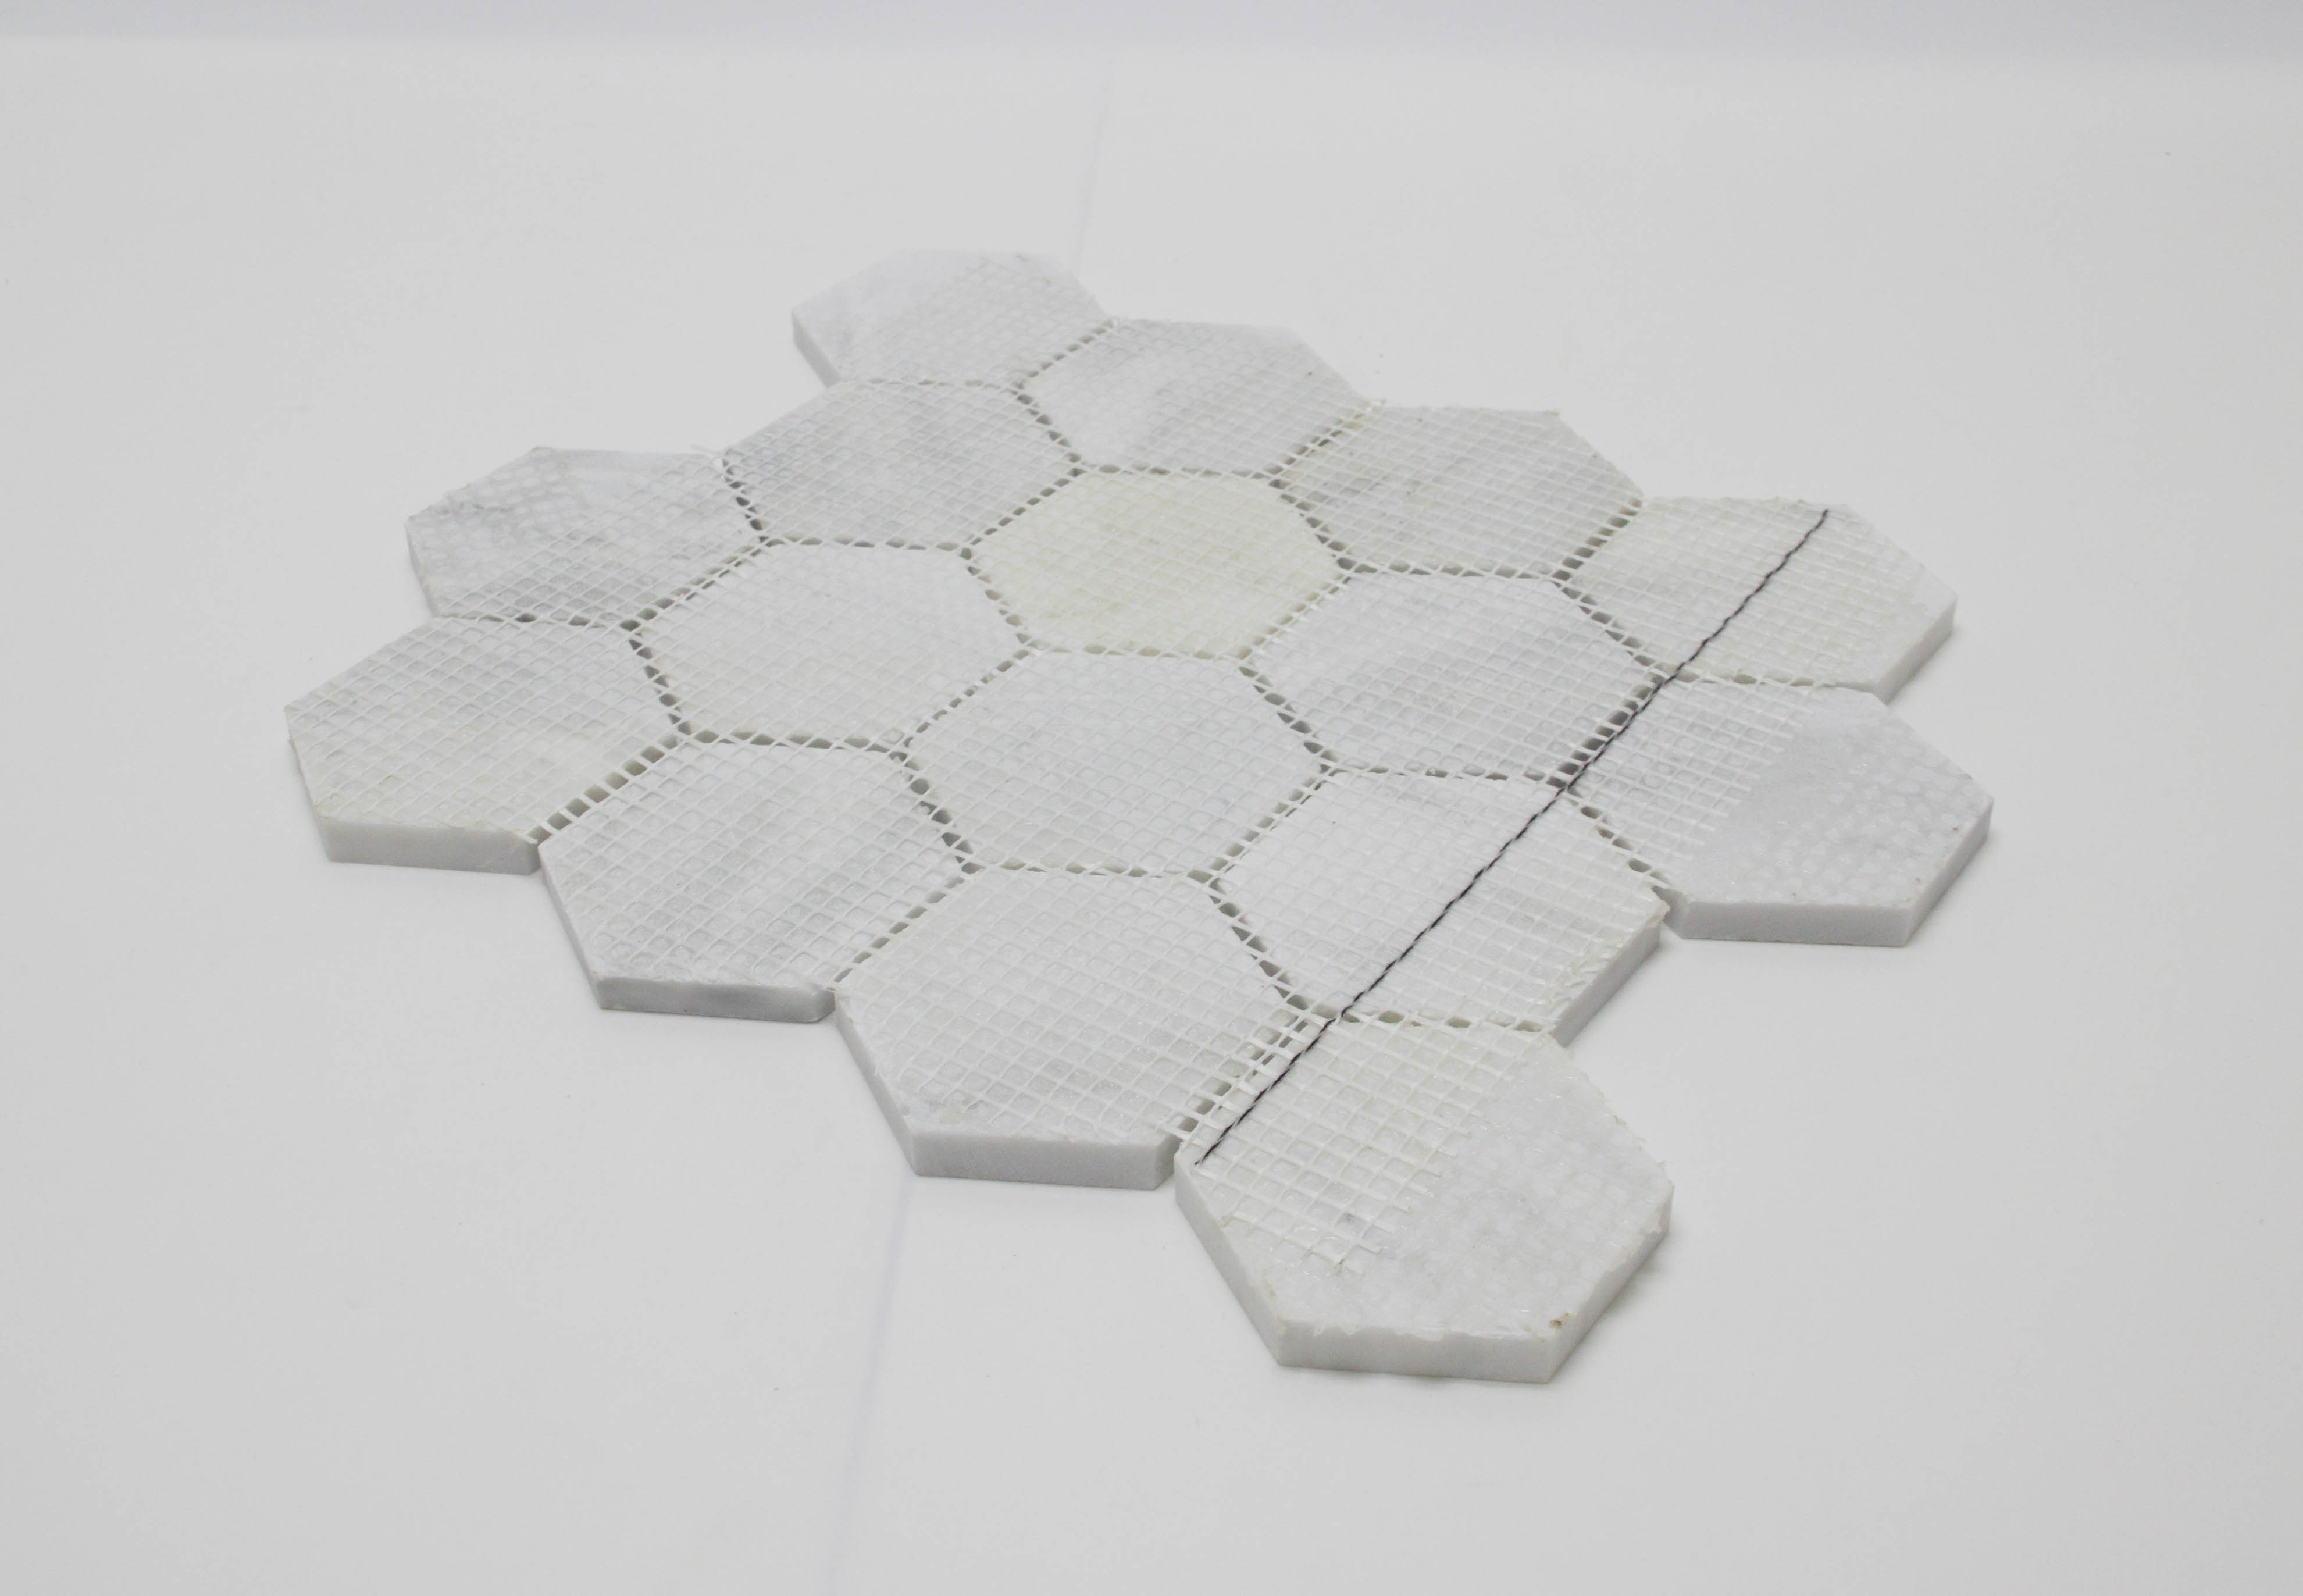 Carrara White Marble Mosaic Tile Hexagon Tiel Natural